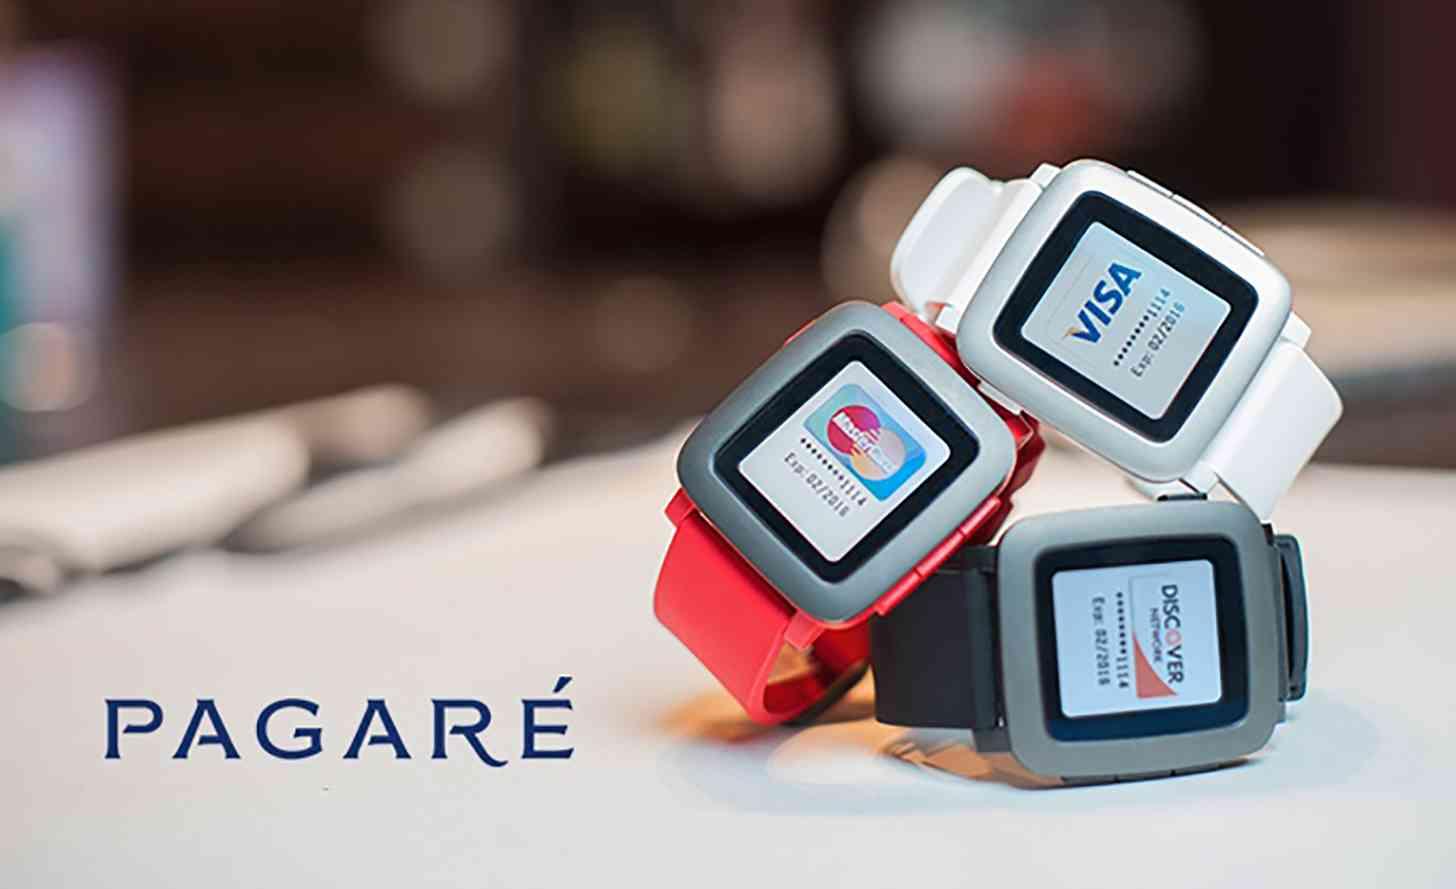 Pagaré NFC Smartstrap Pebble